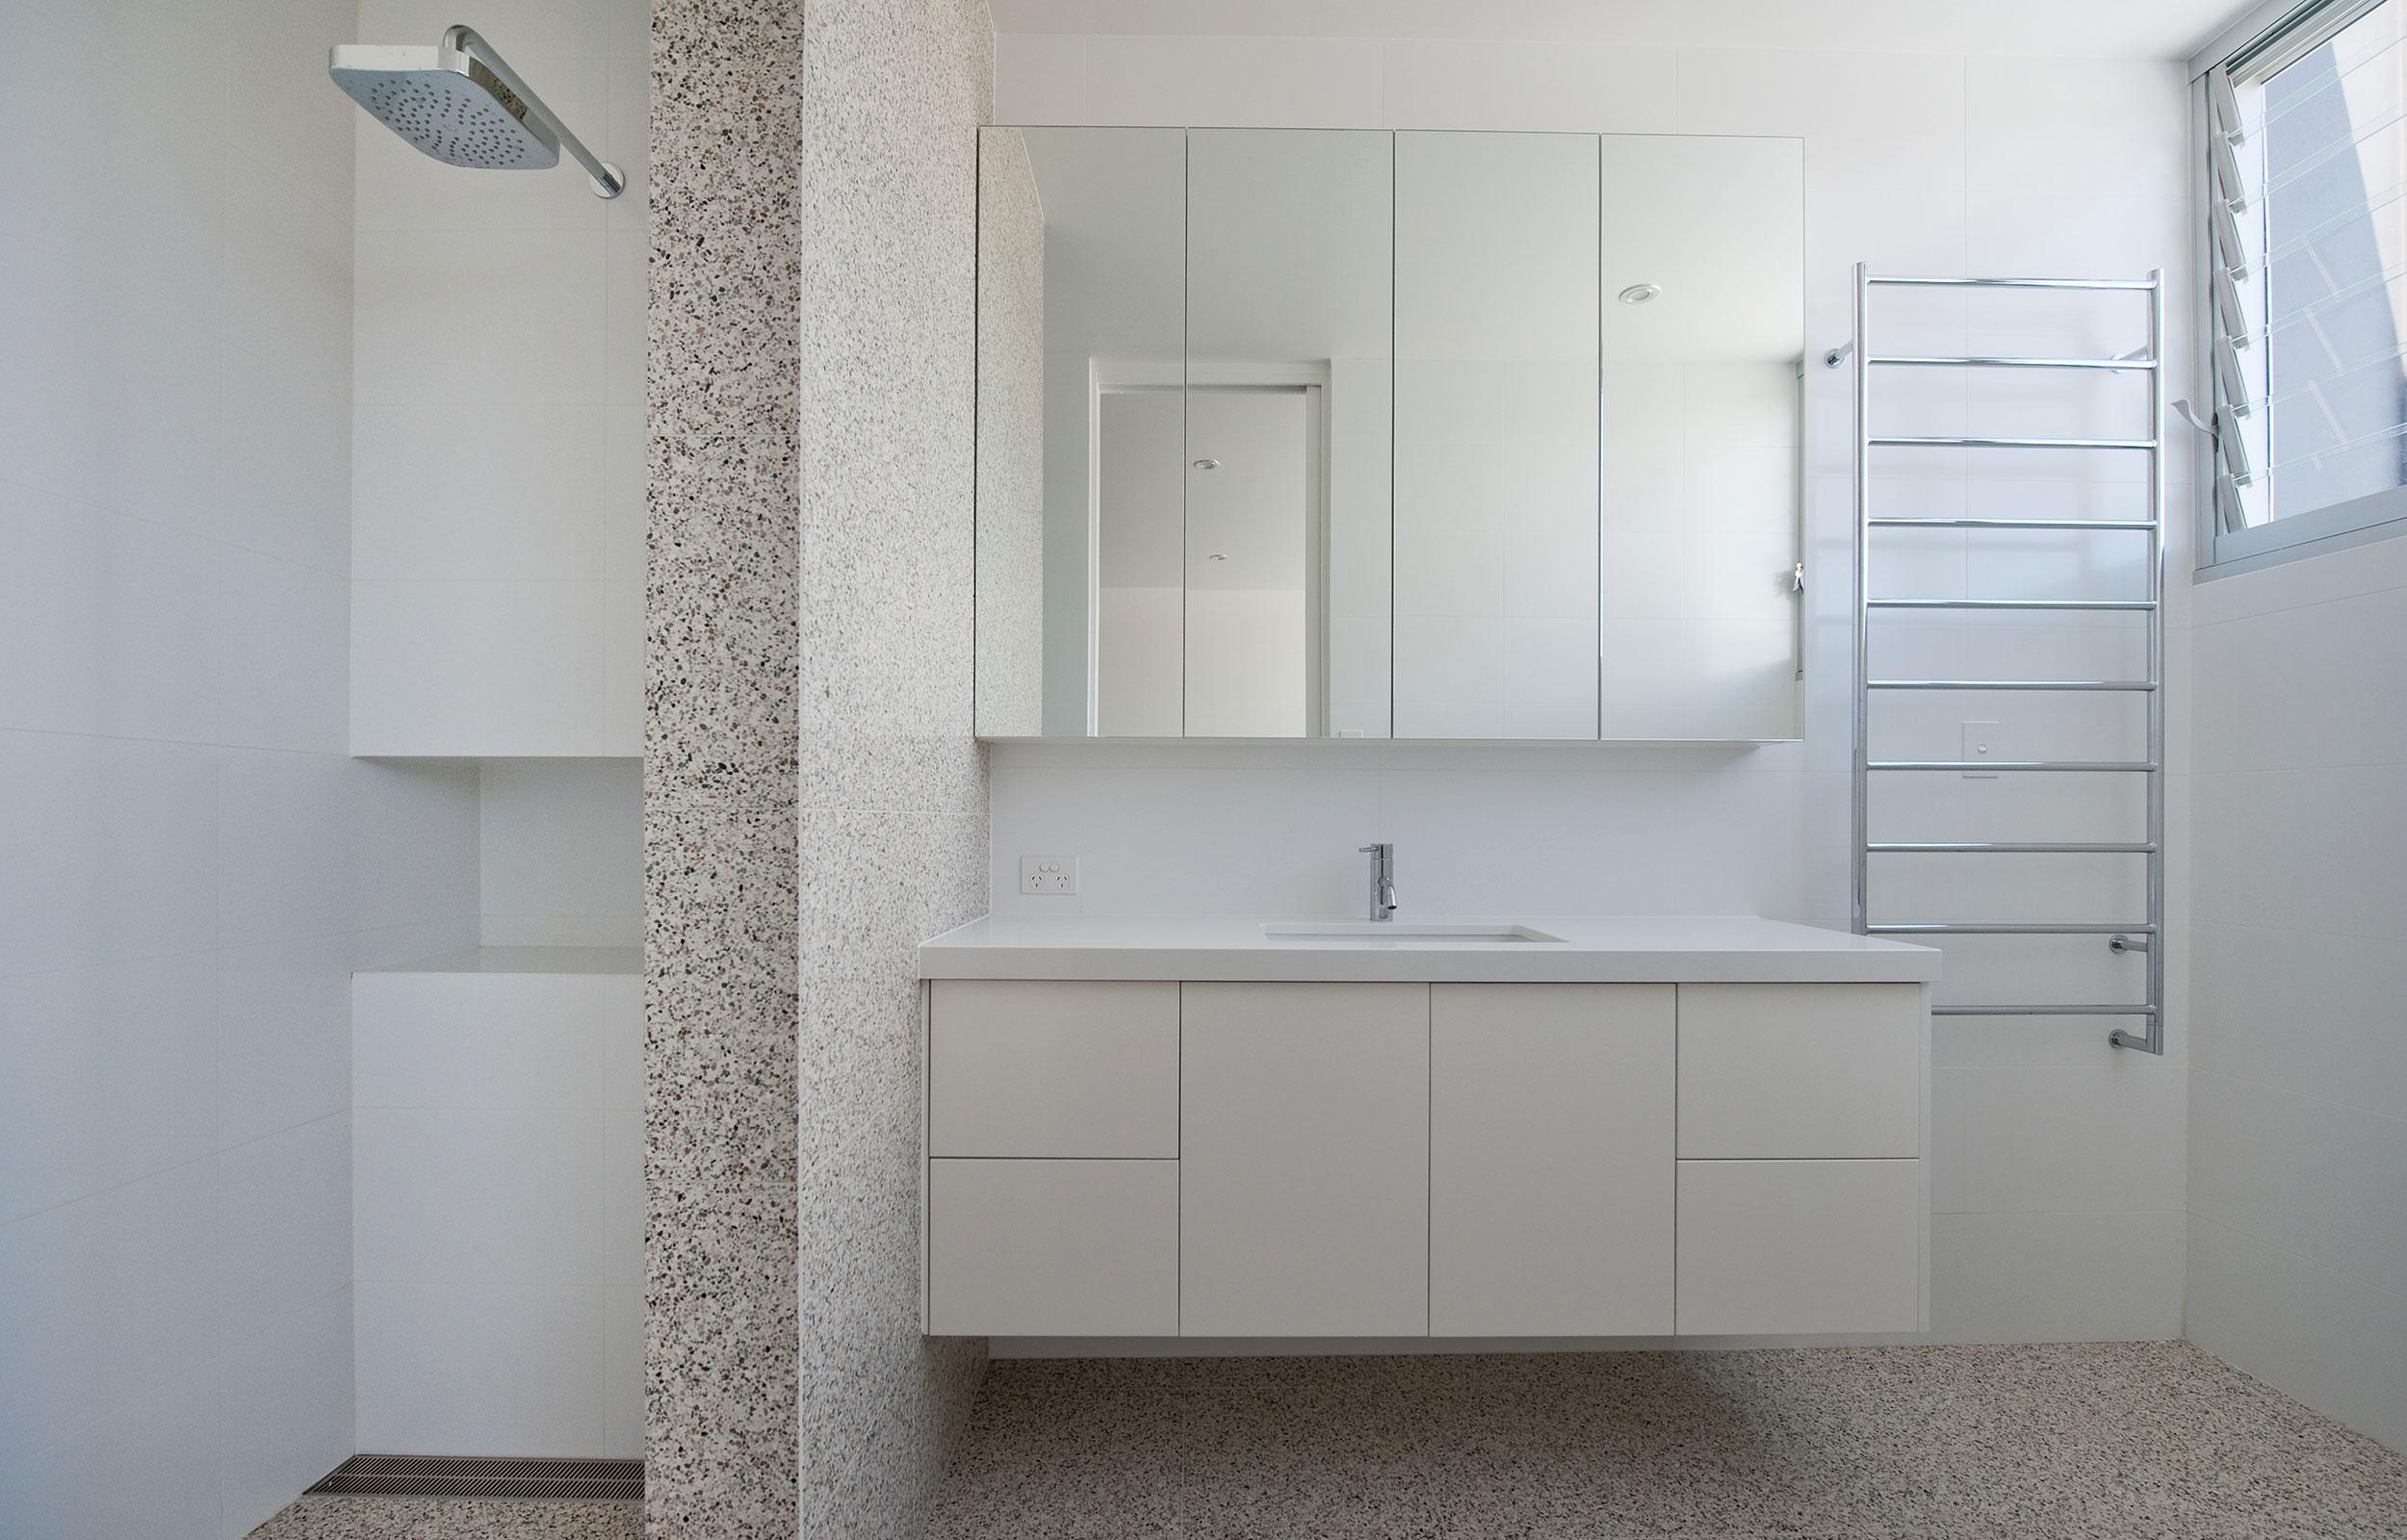 enoki-interior-Halbert-7.jpg